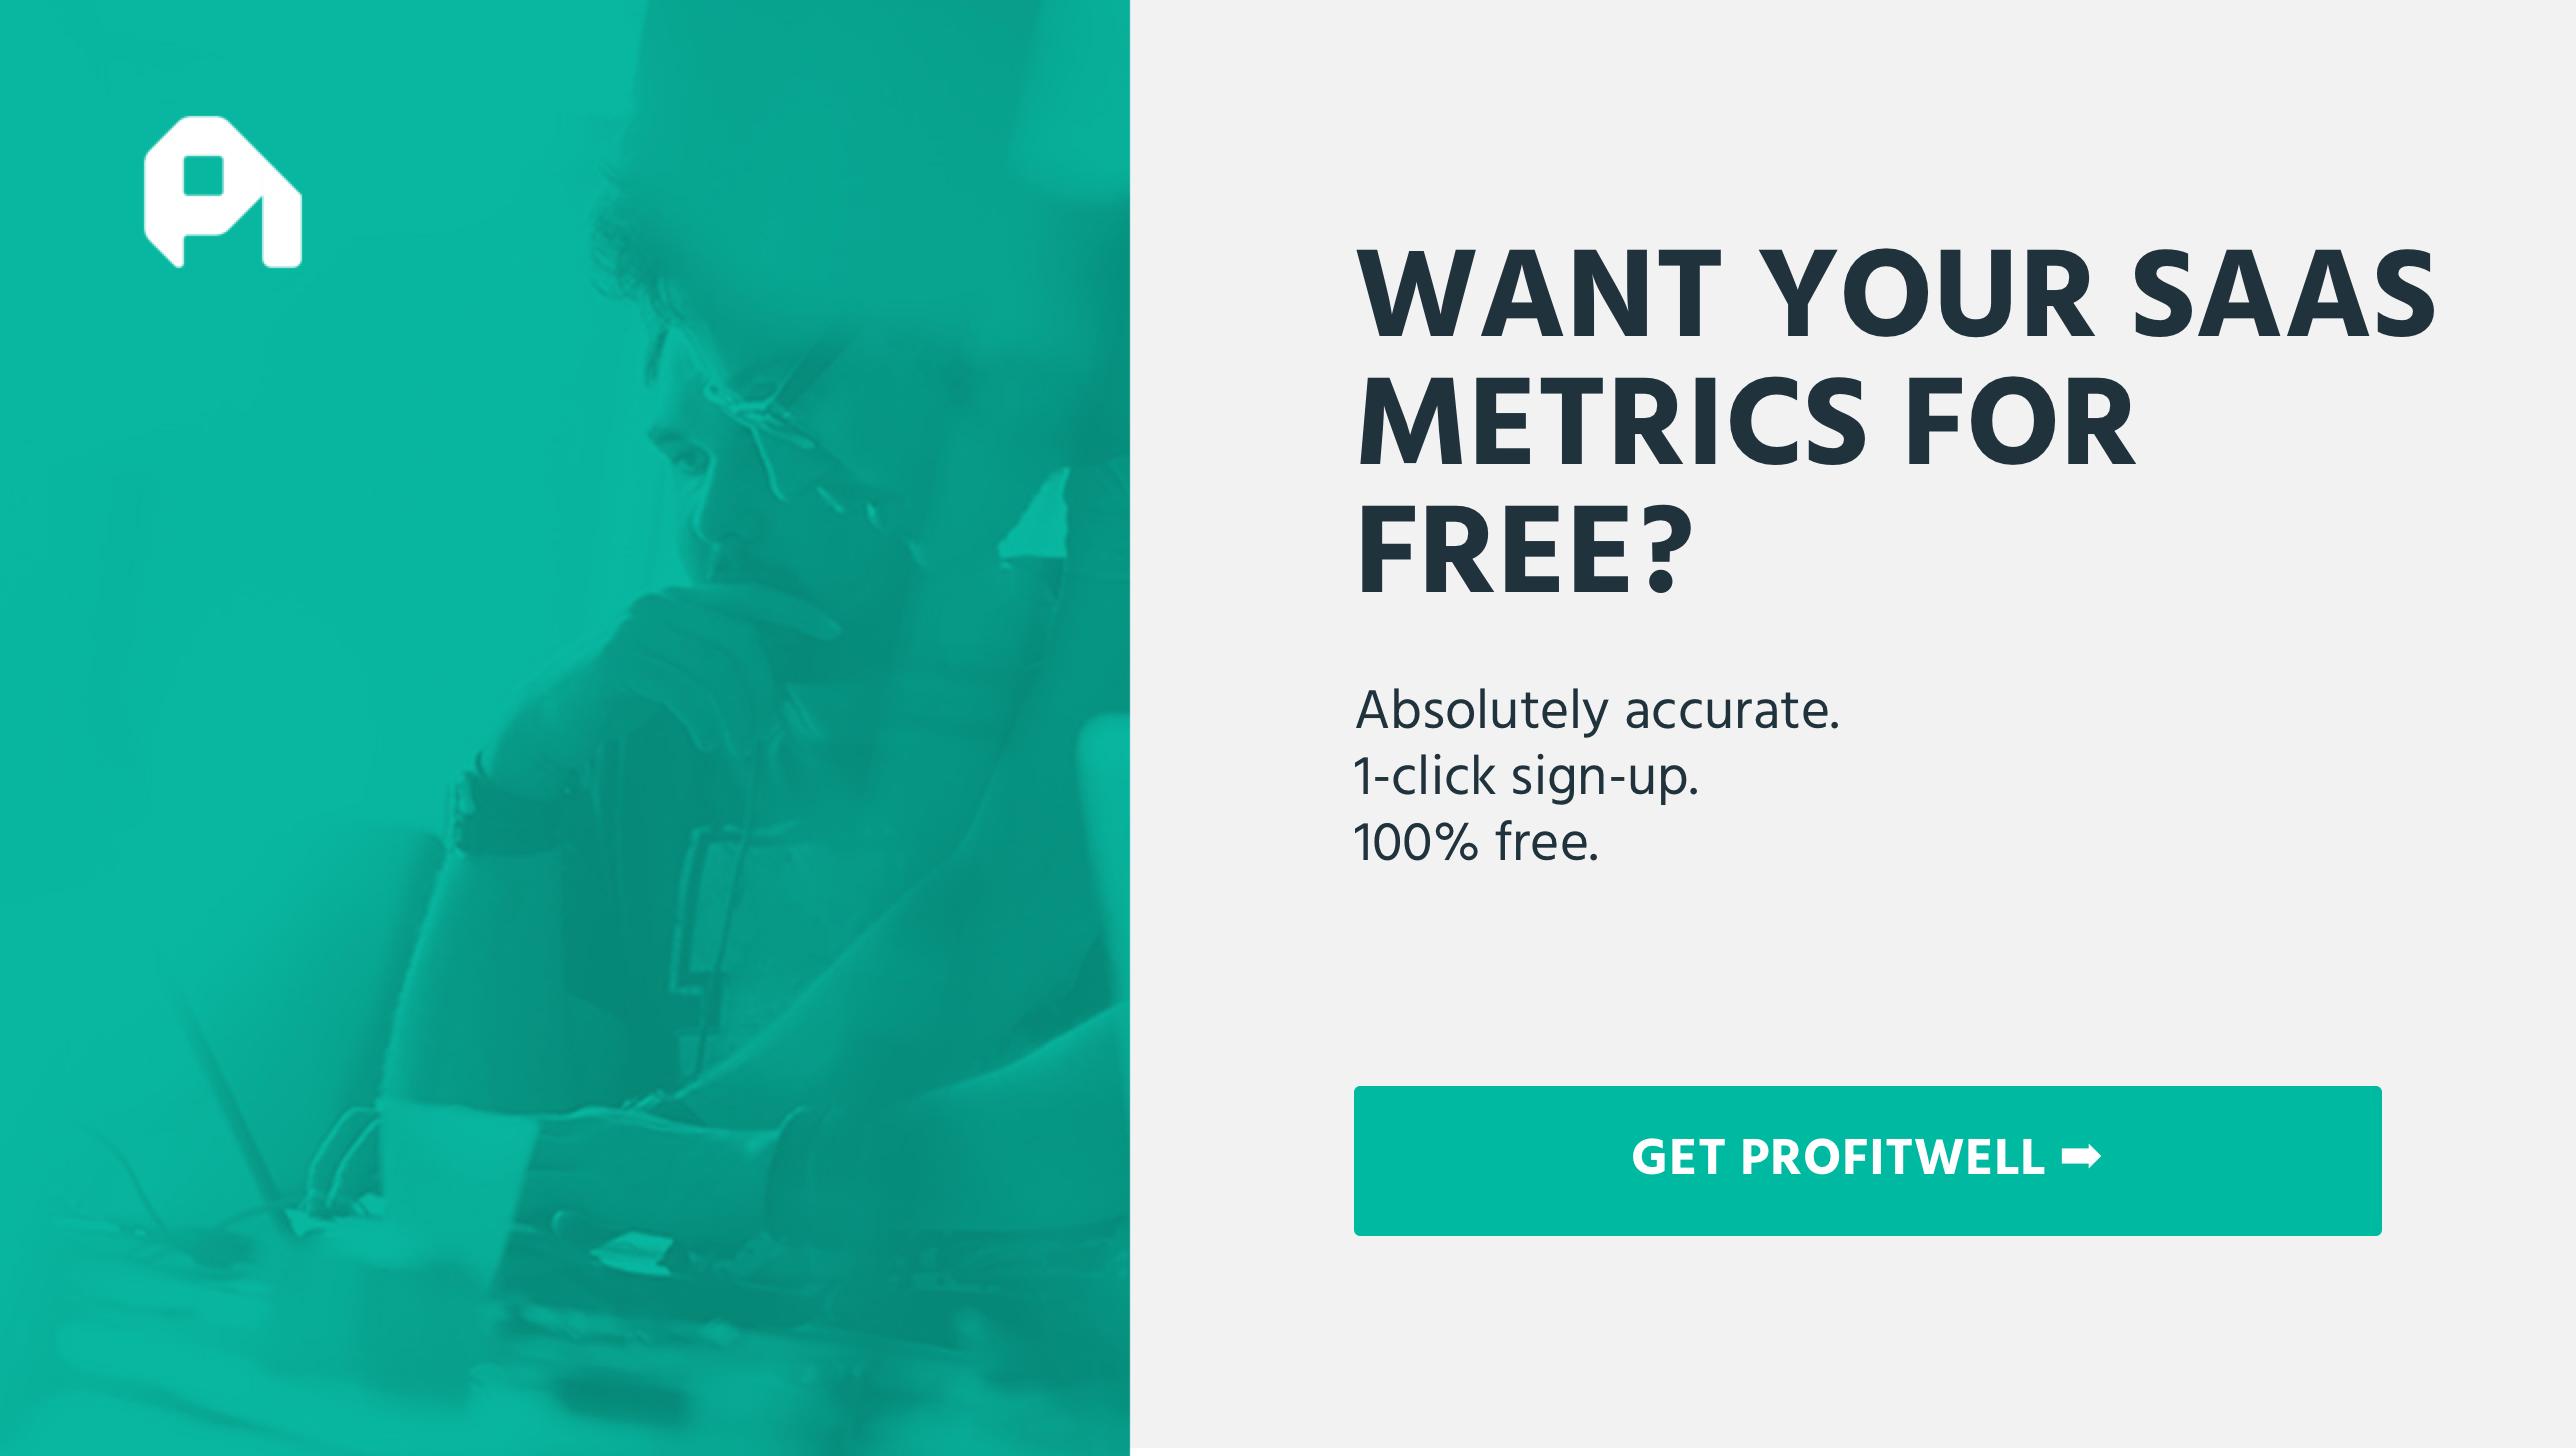 free-saas-metrics-big.png